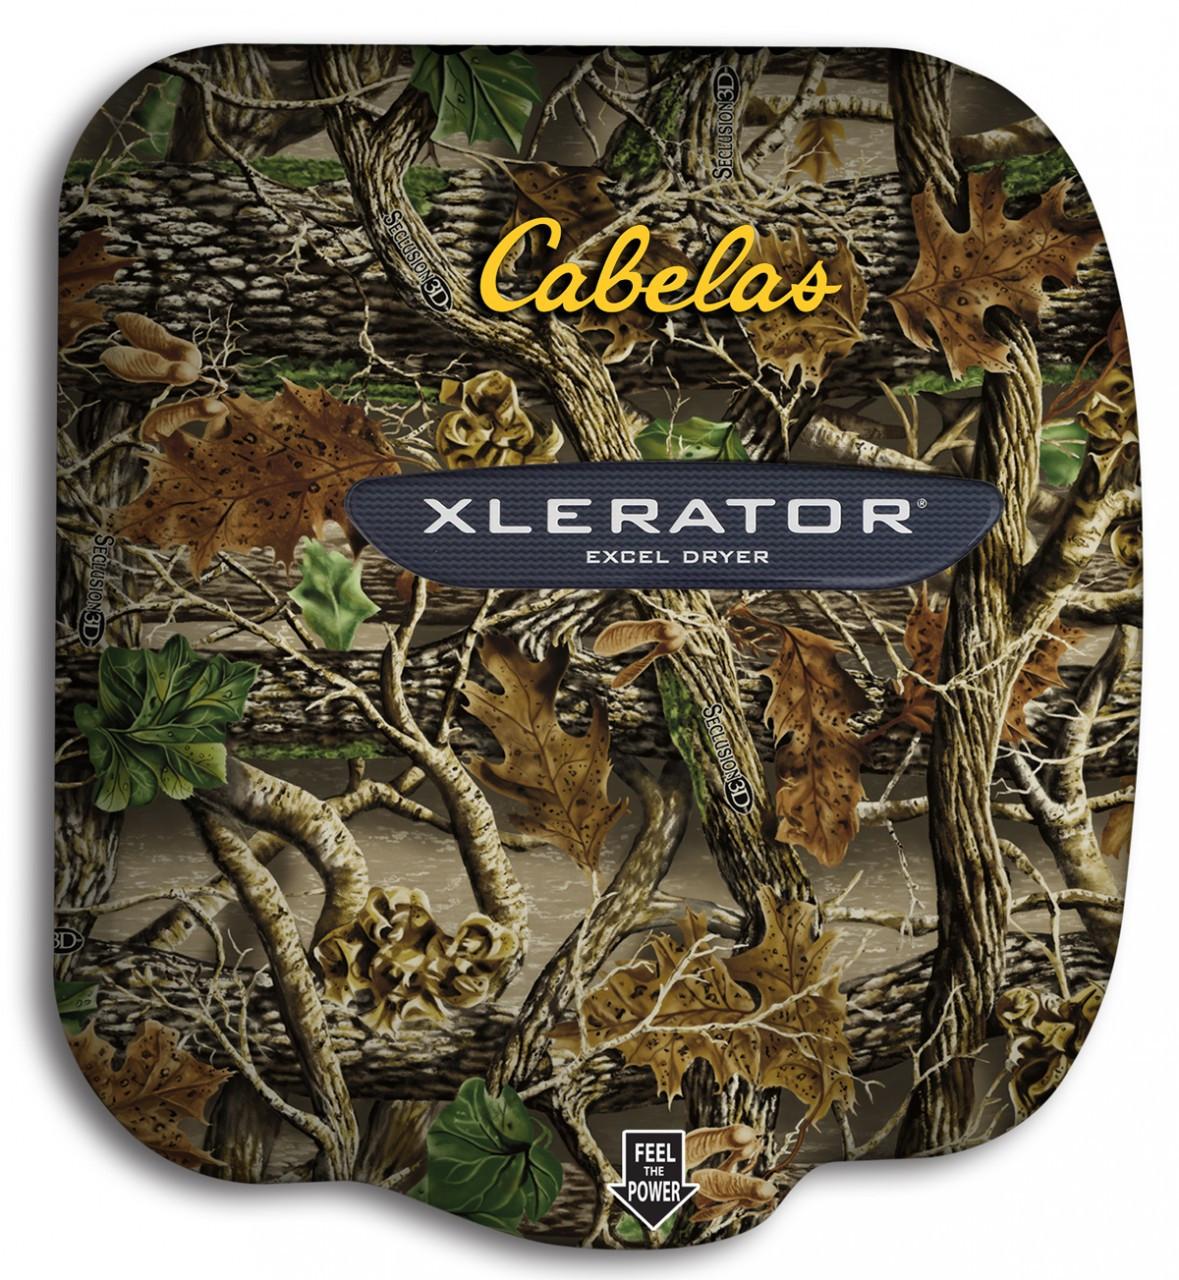 xlerator xl si hand dryer custom cover hand dryer target xlerator hand dryer cabela's xlerator xl si hand dryer with custom logo on handdryersupply